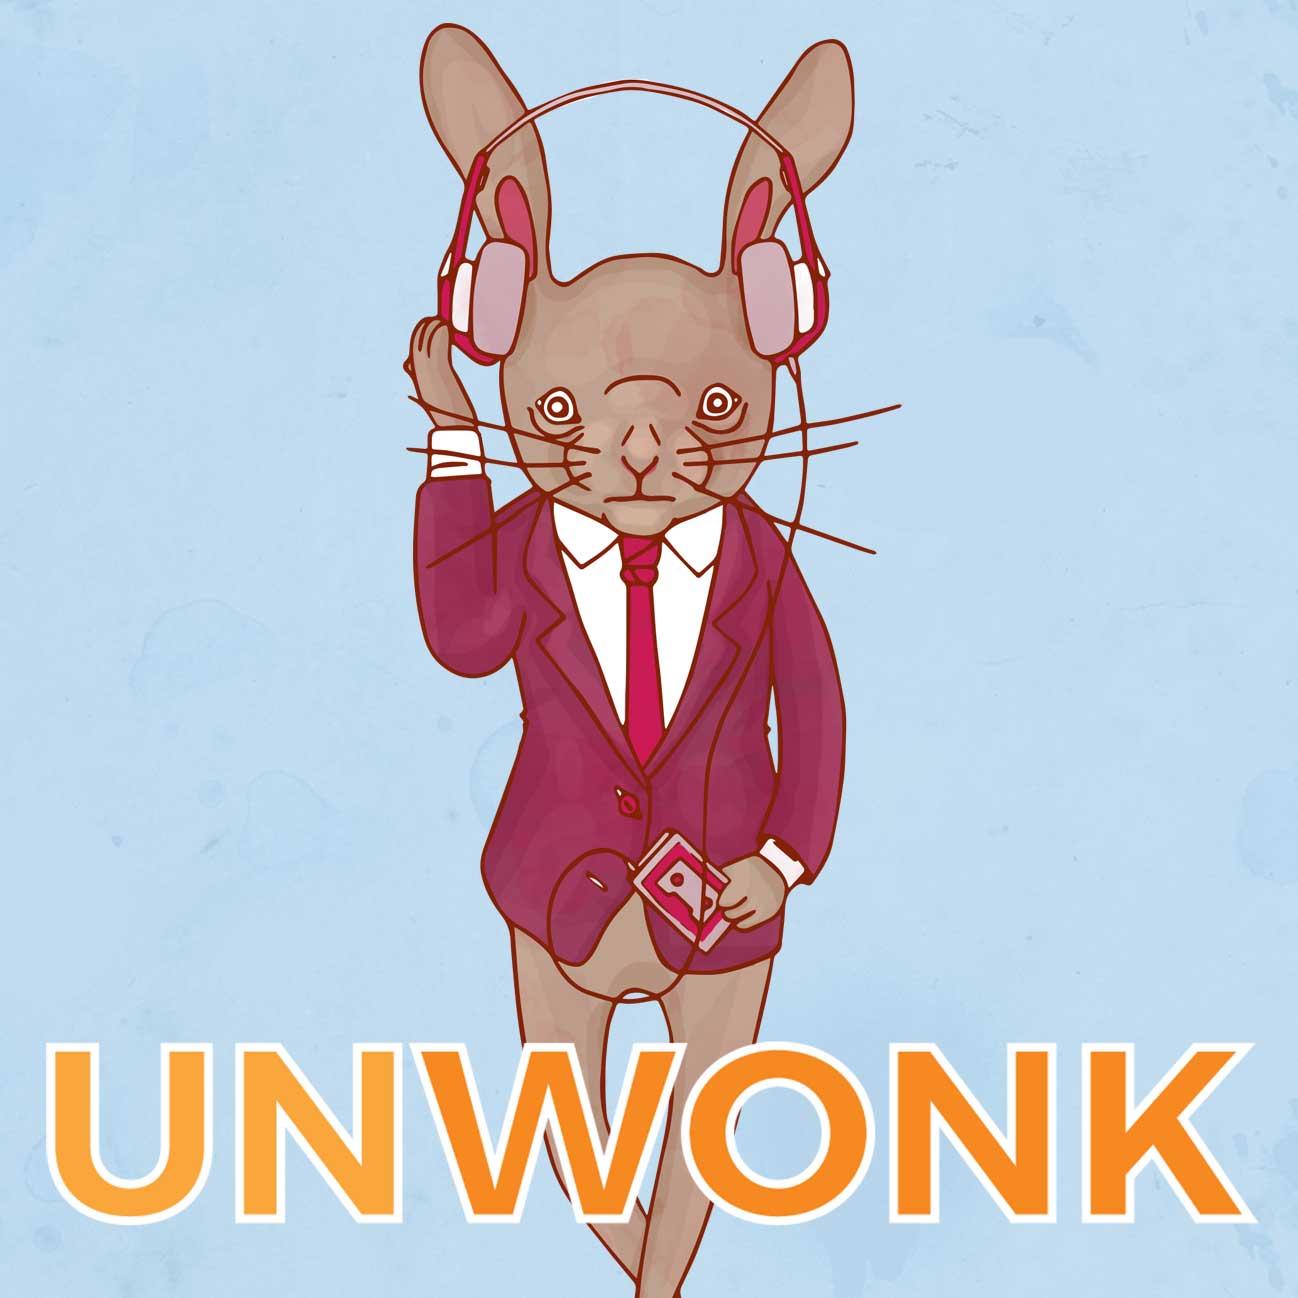 Unwonk